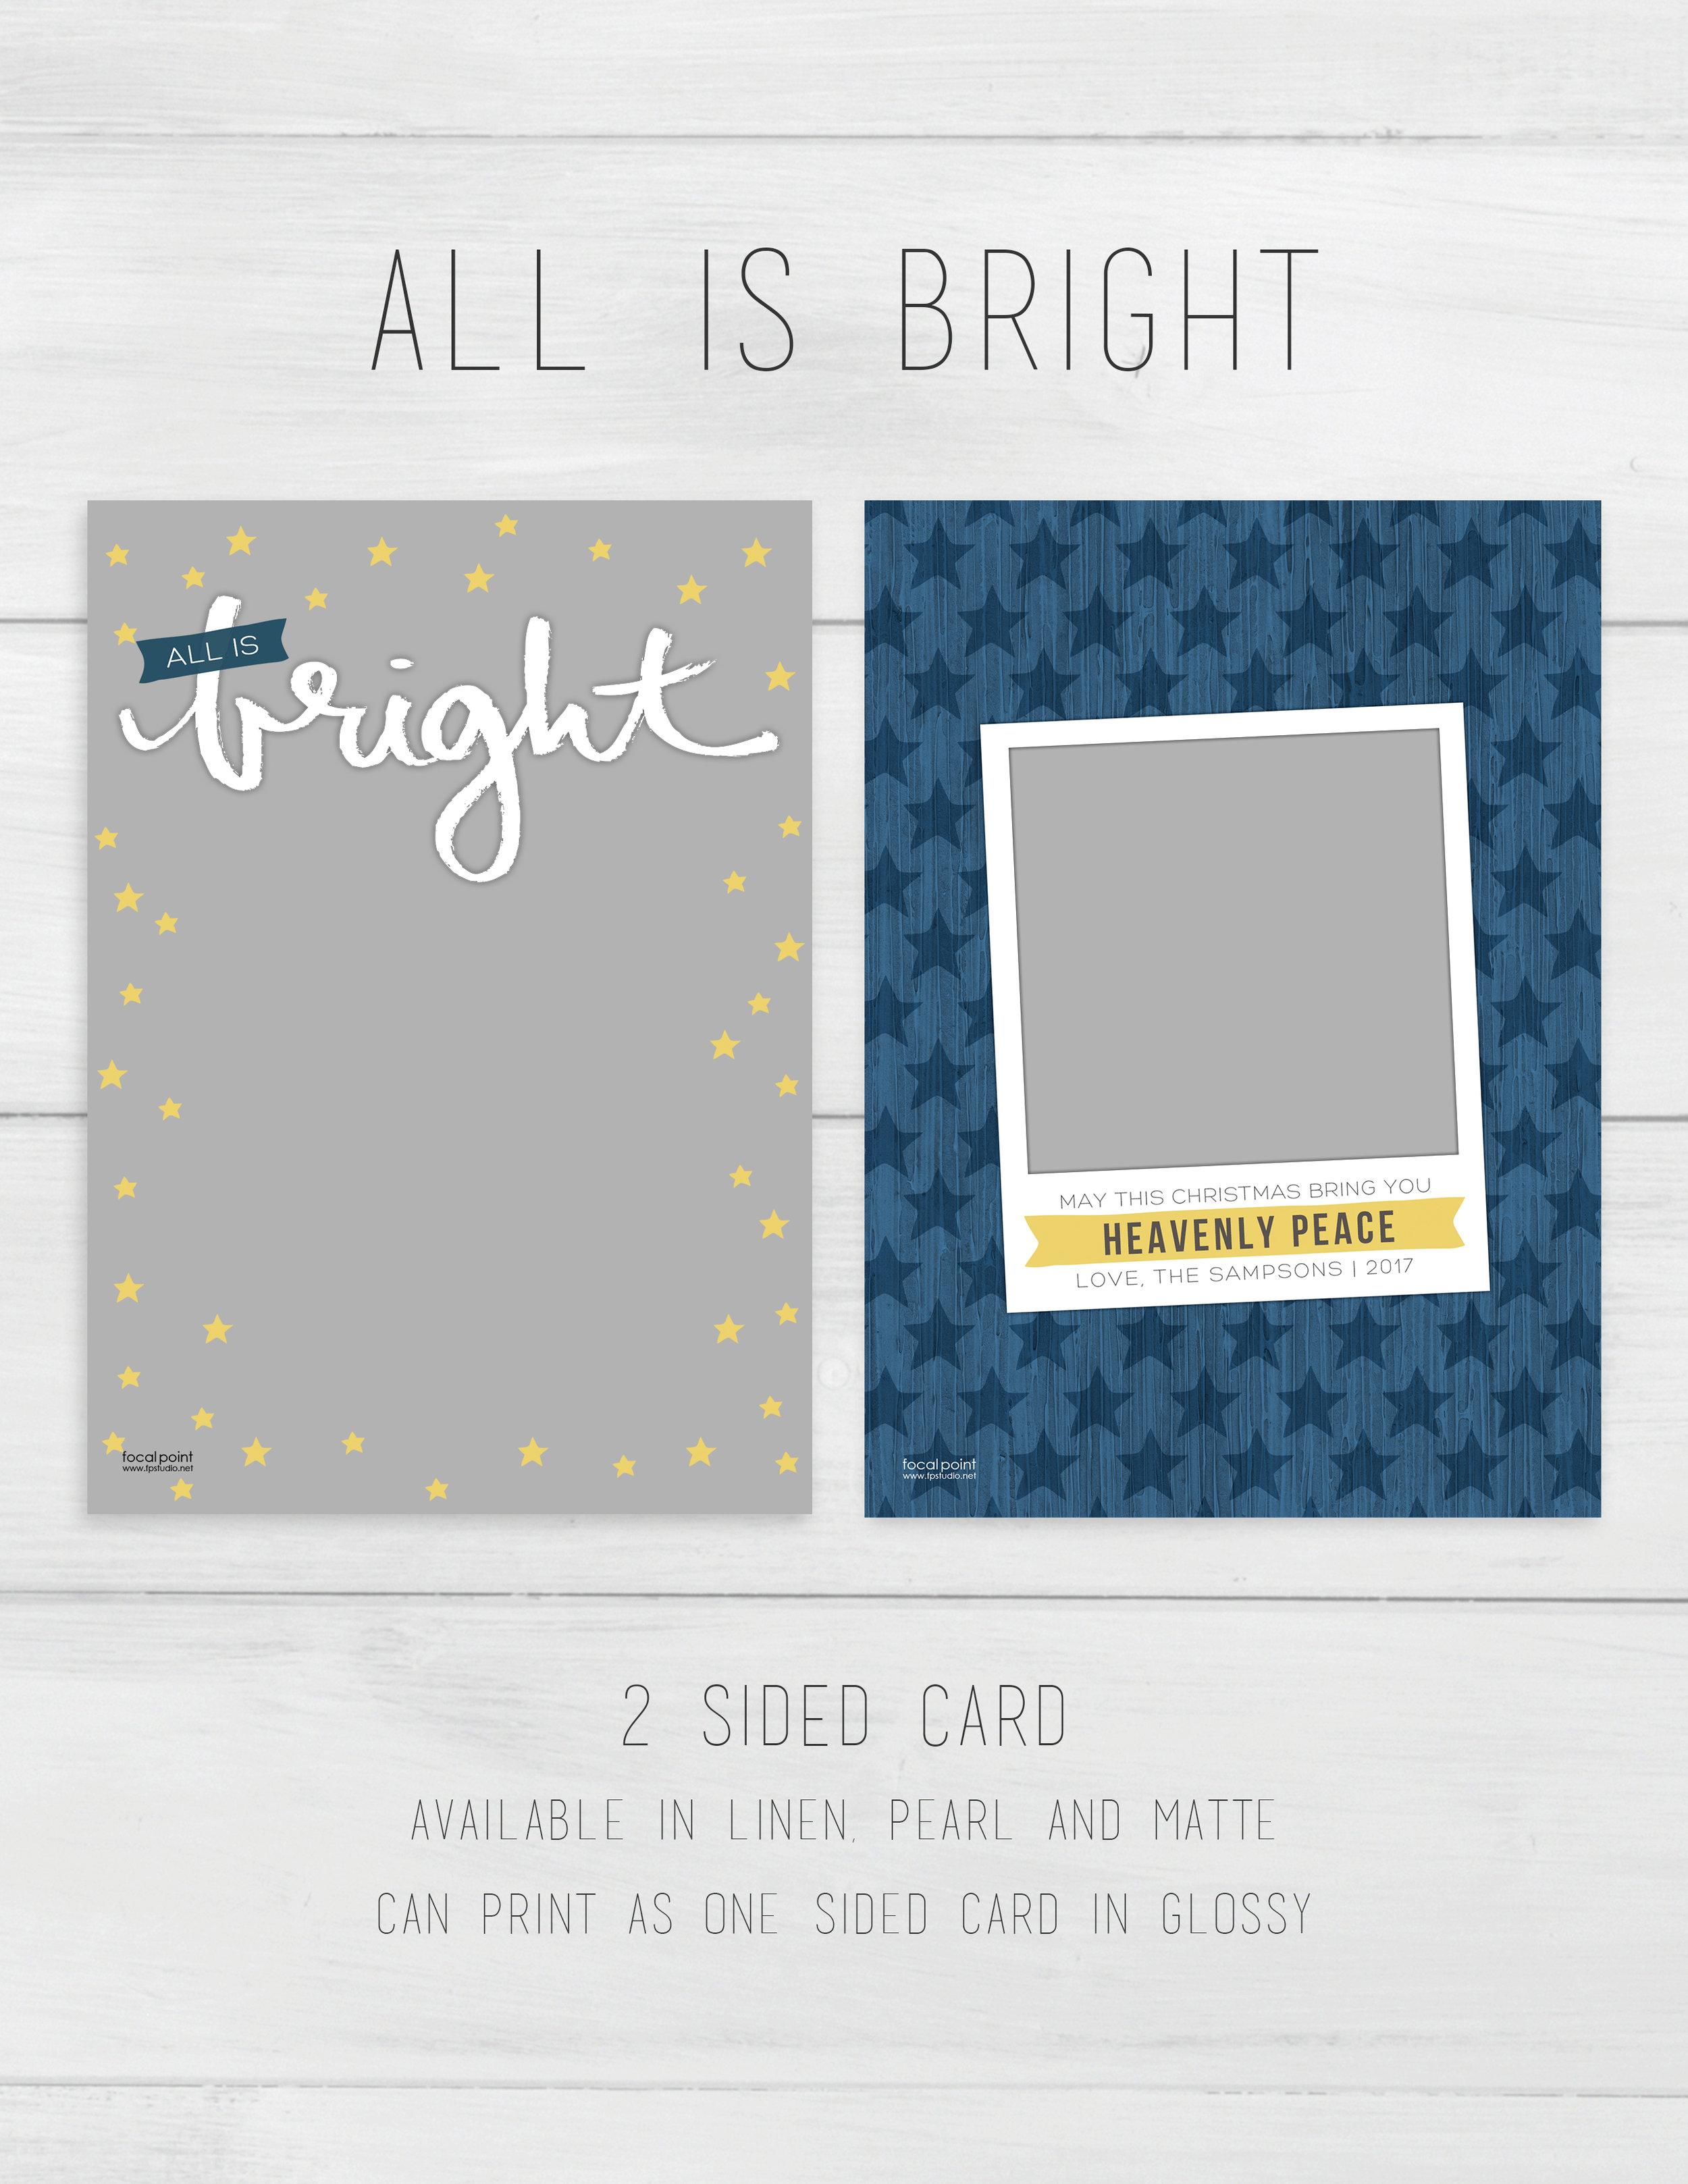 DISPLAY_2SIDE_All_is_Bright.jpg